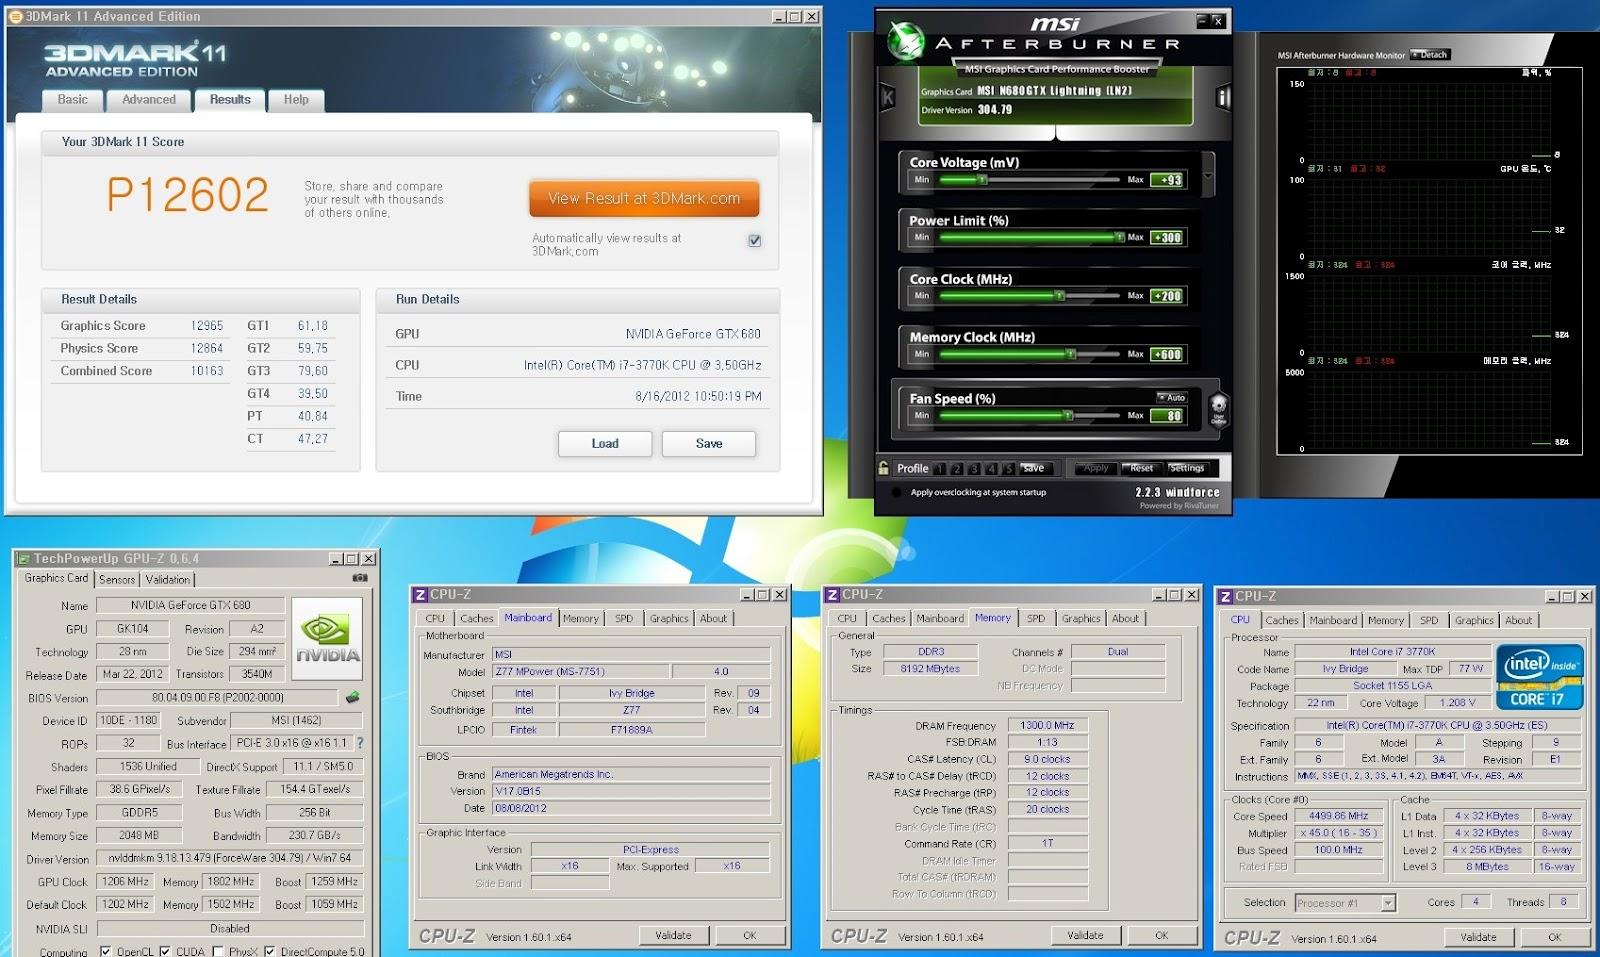 MSI Z77 MPower - Ivy Bridge (Z77) OC - HWBOT Community Forums